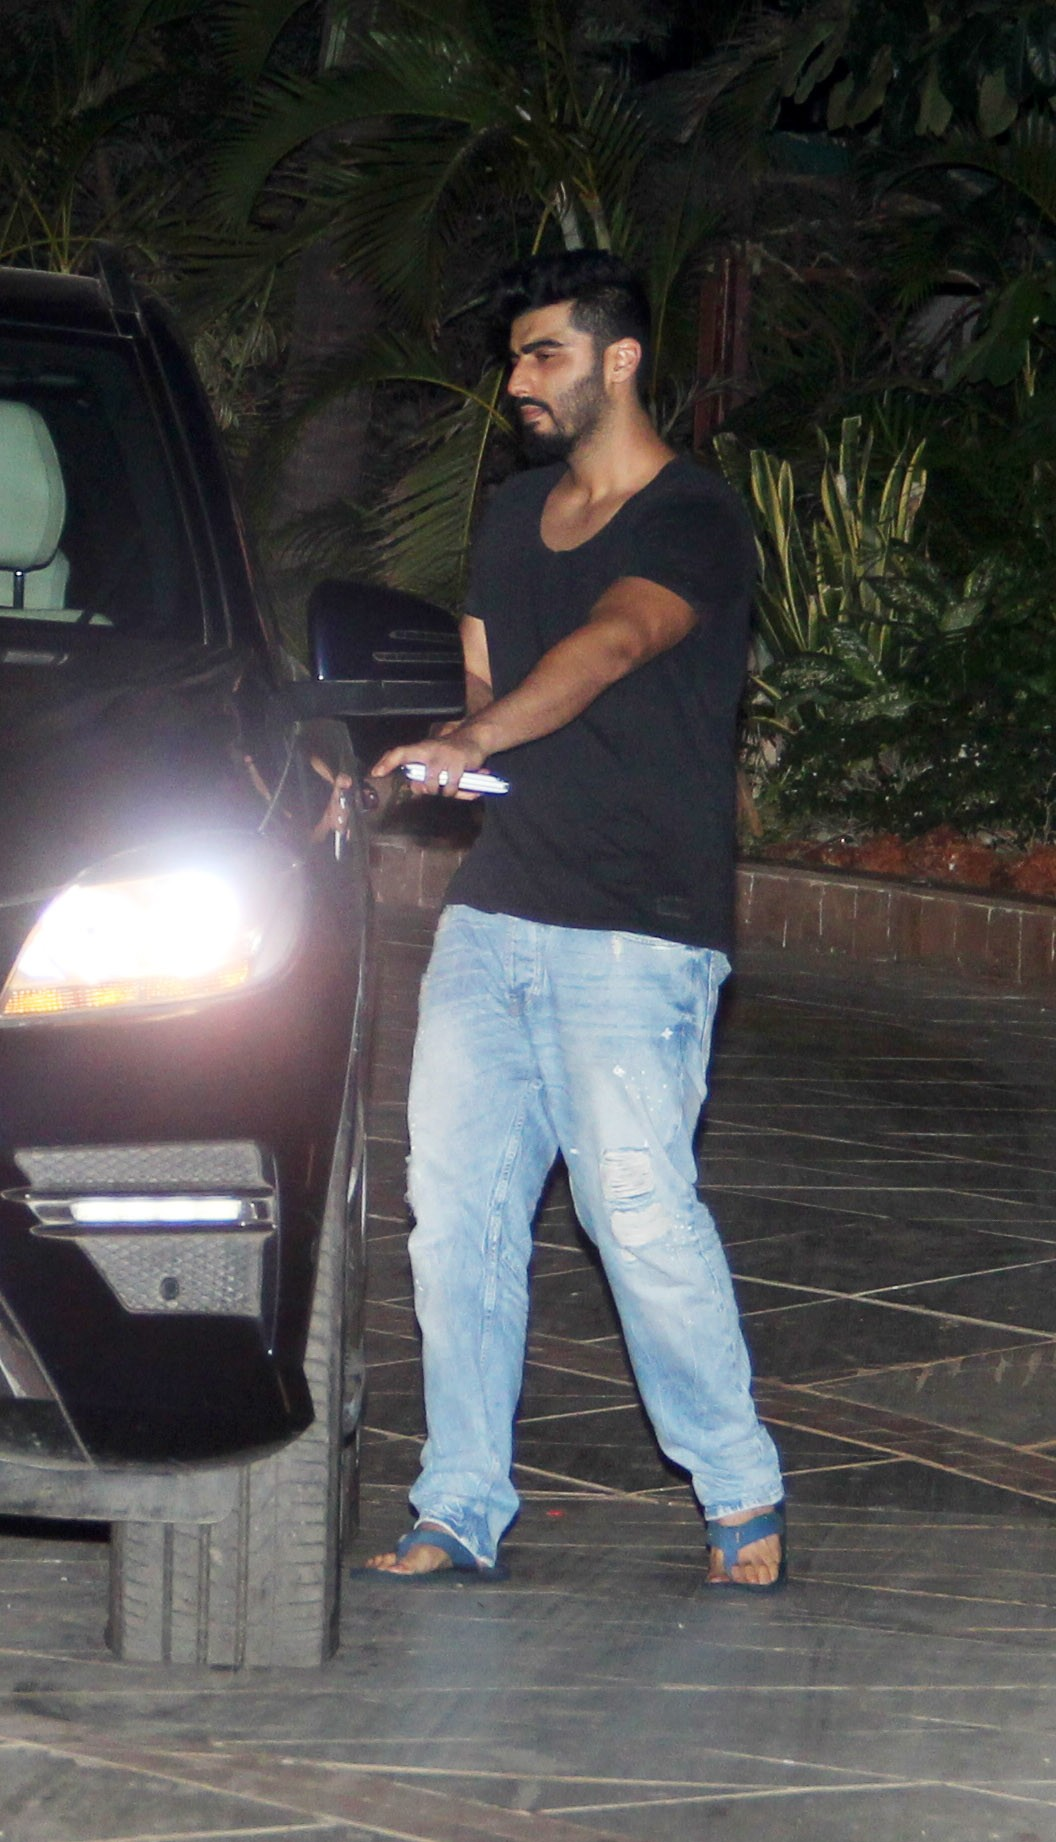 Anushka Sharma, Arjun Kapoor and Other B-Town Celebs At Ranbir Kapoor's Residence